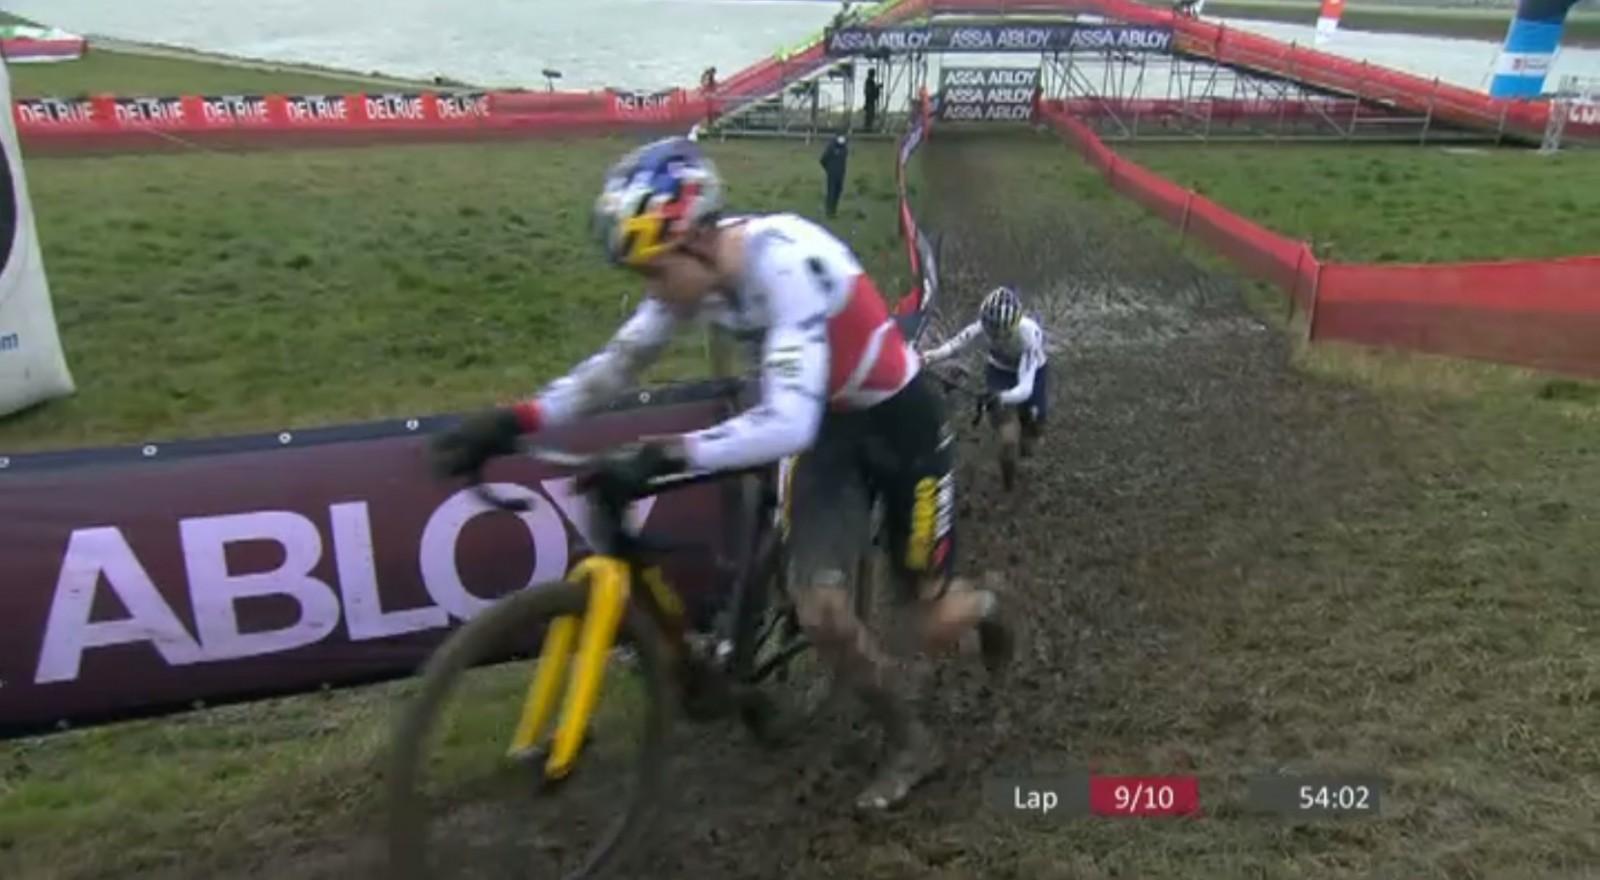 van-der-poel-copa-mundo-ciclocross-hulst/